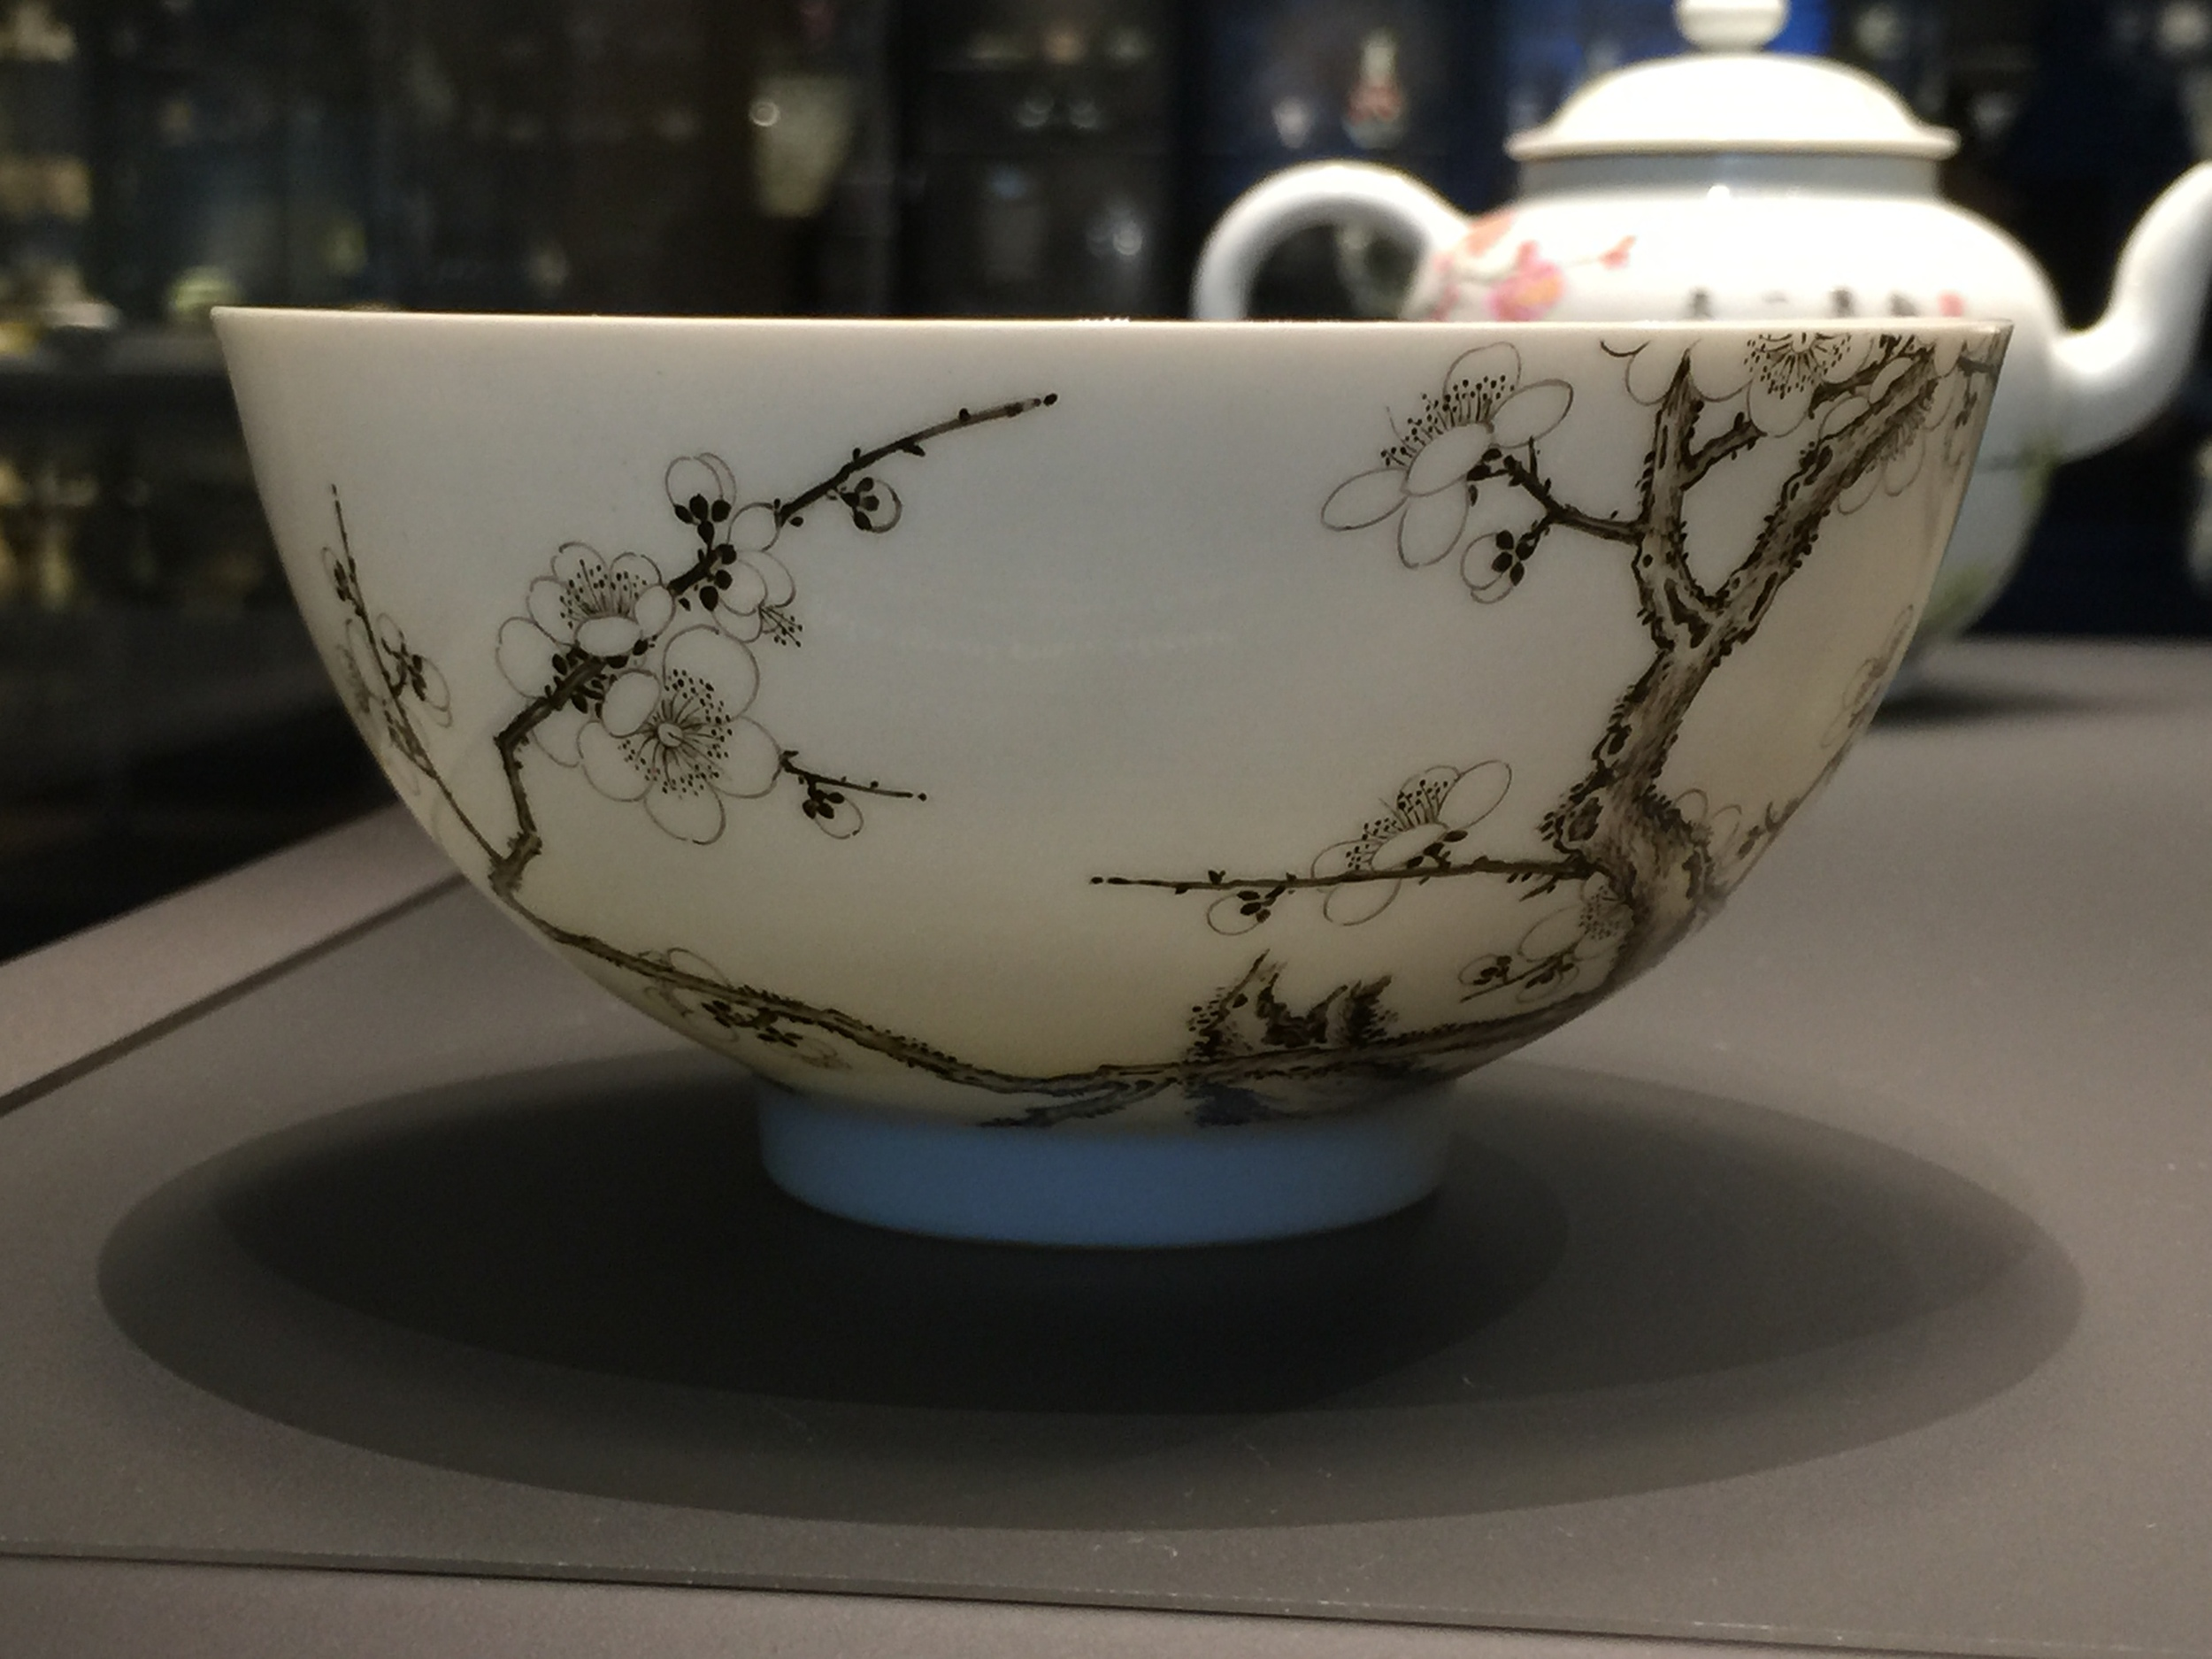 Chinese-Porcelain-British-Museum-Percival-David-jessewaugh.com-88.jpg